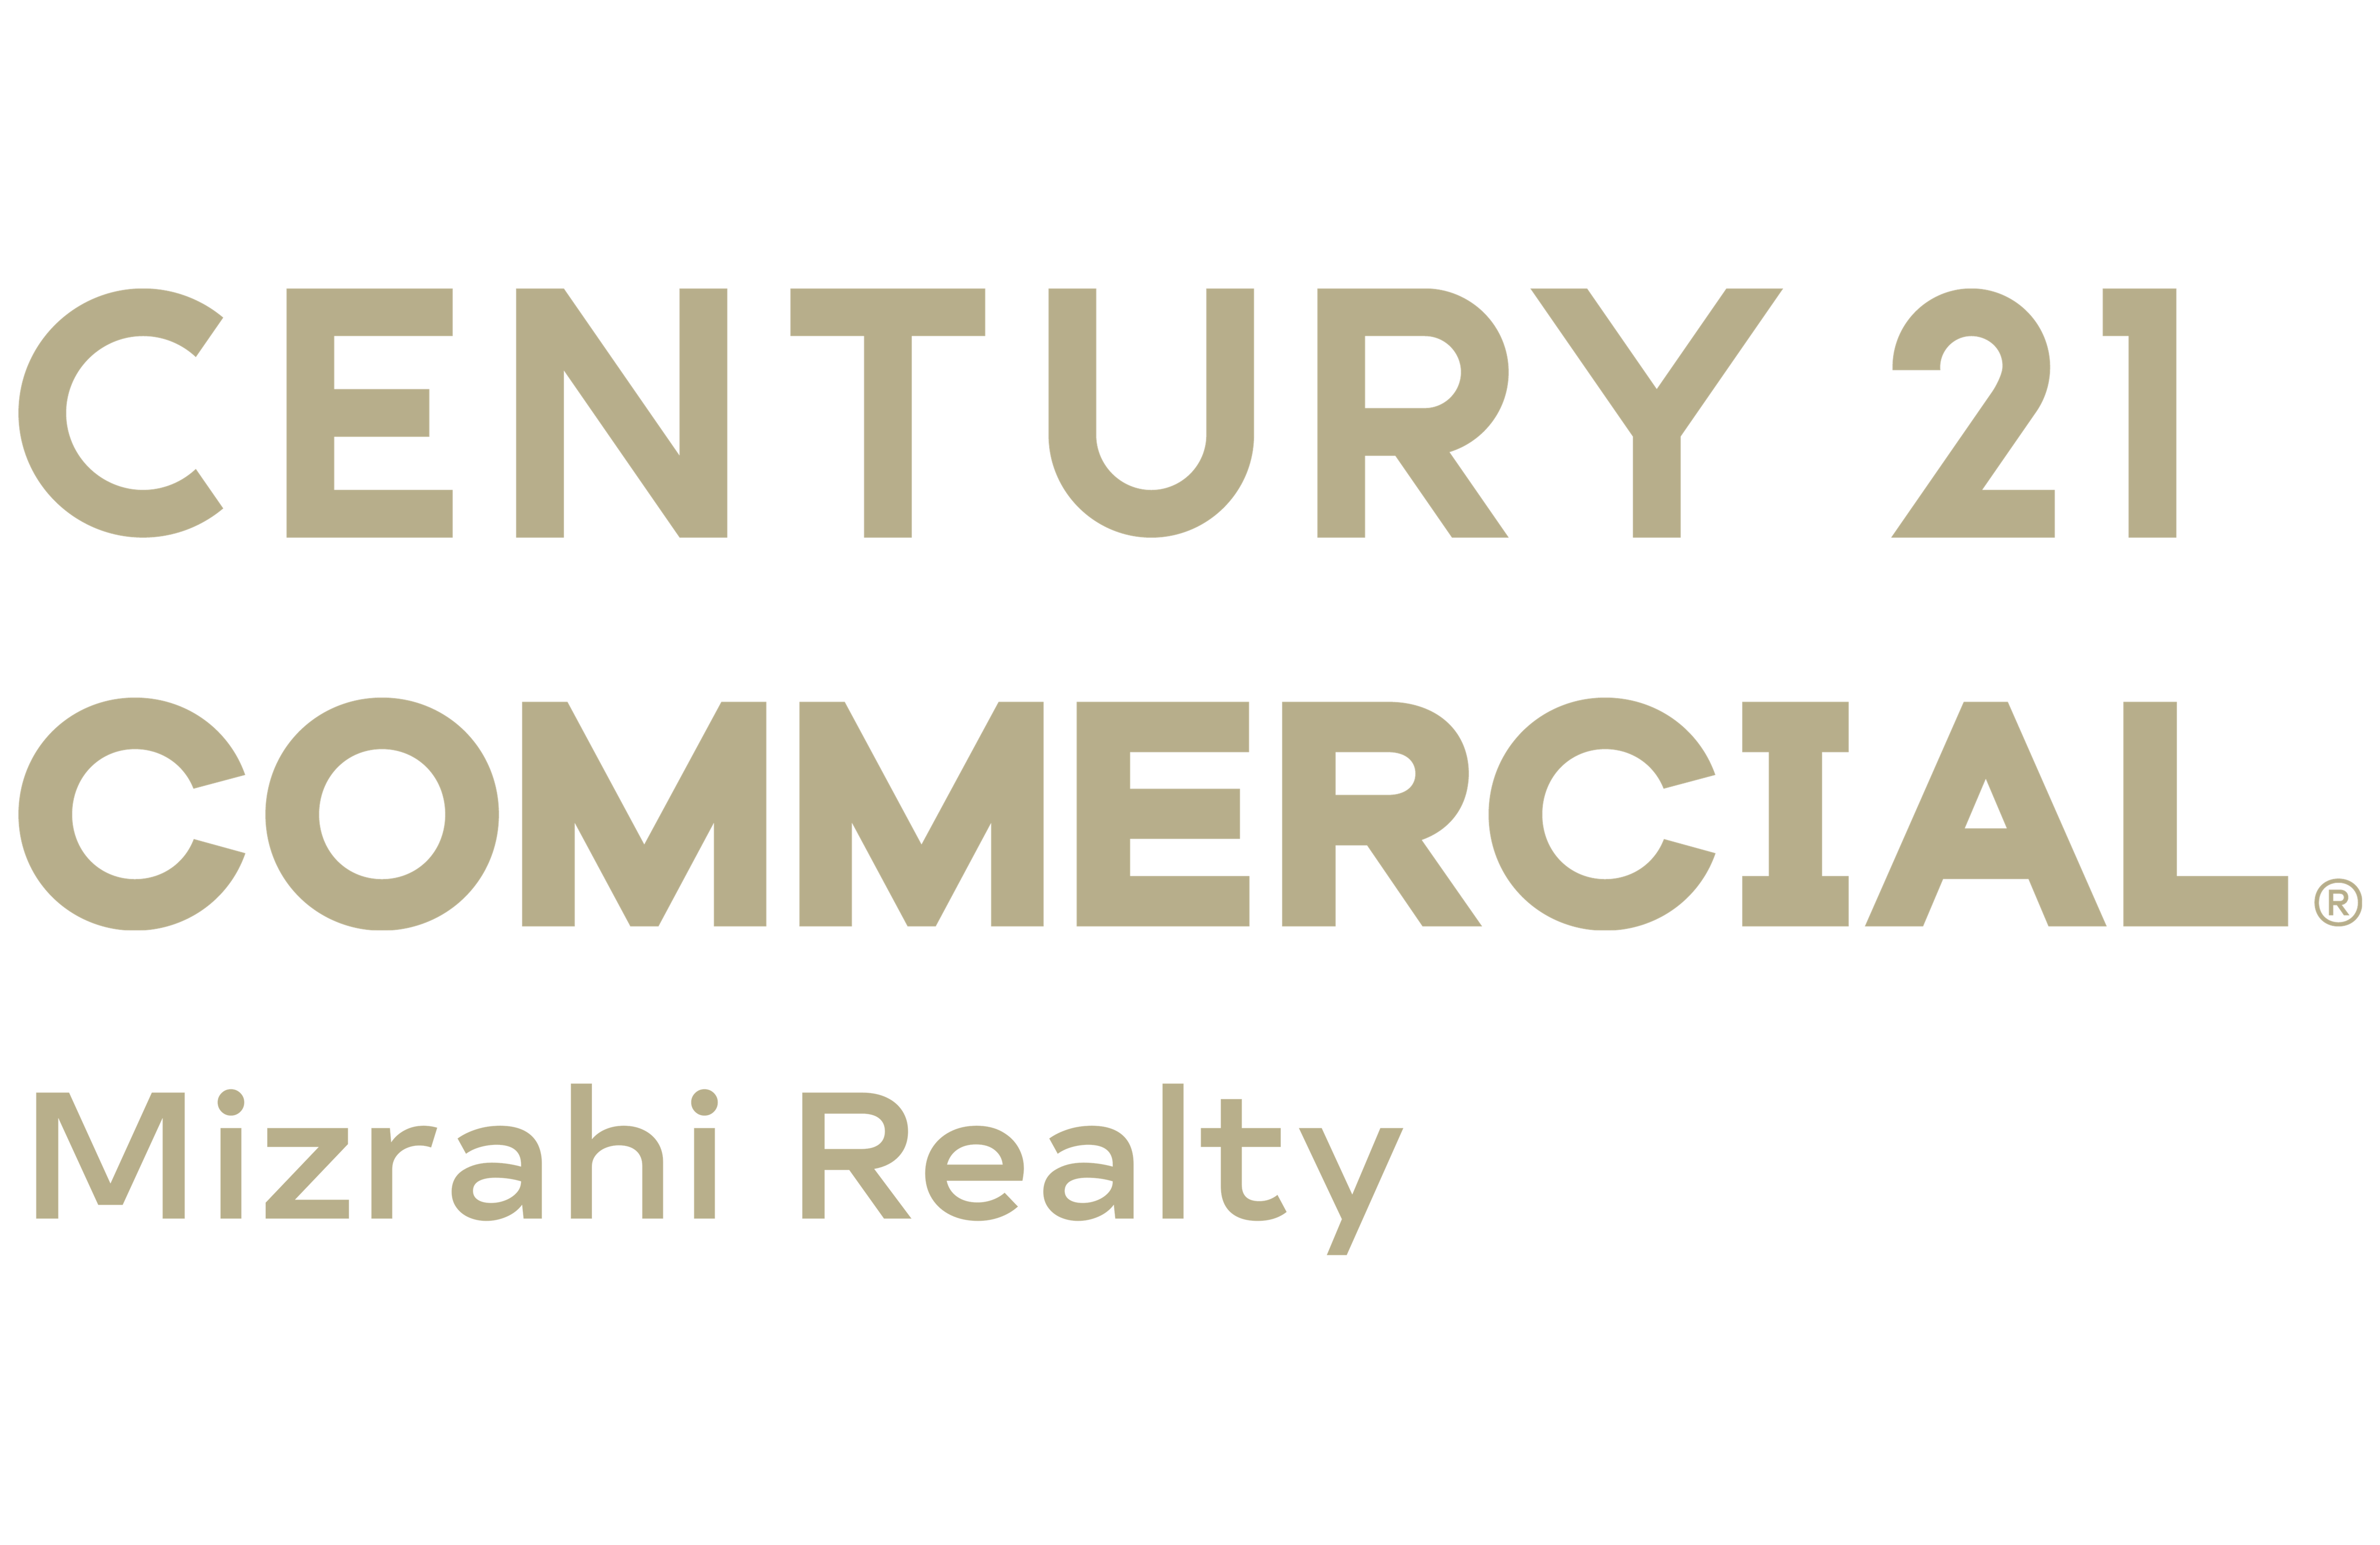 Samuel I. Mizrahi of CENTURY 21 Mizrahi Realty logo